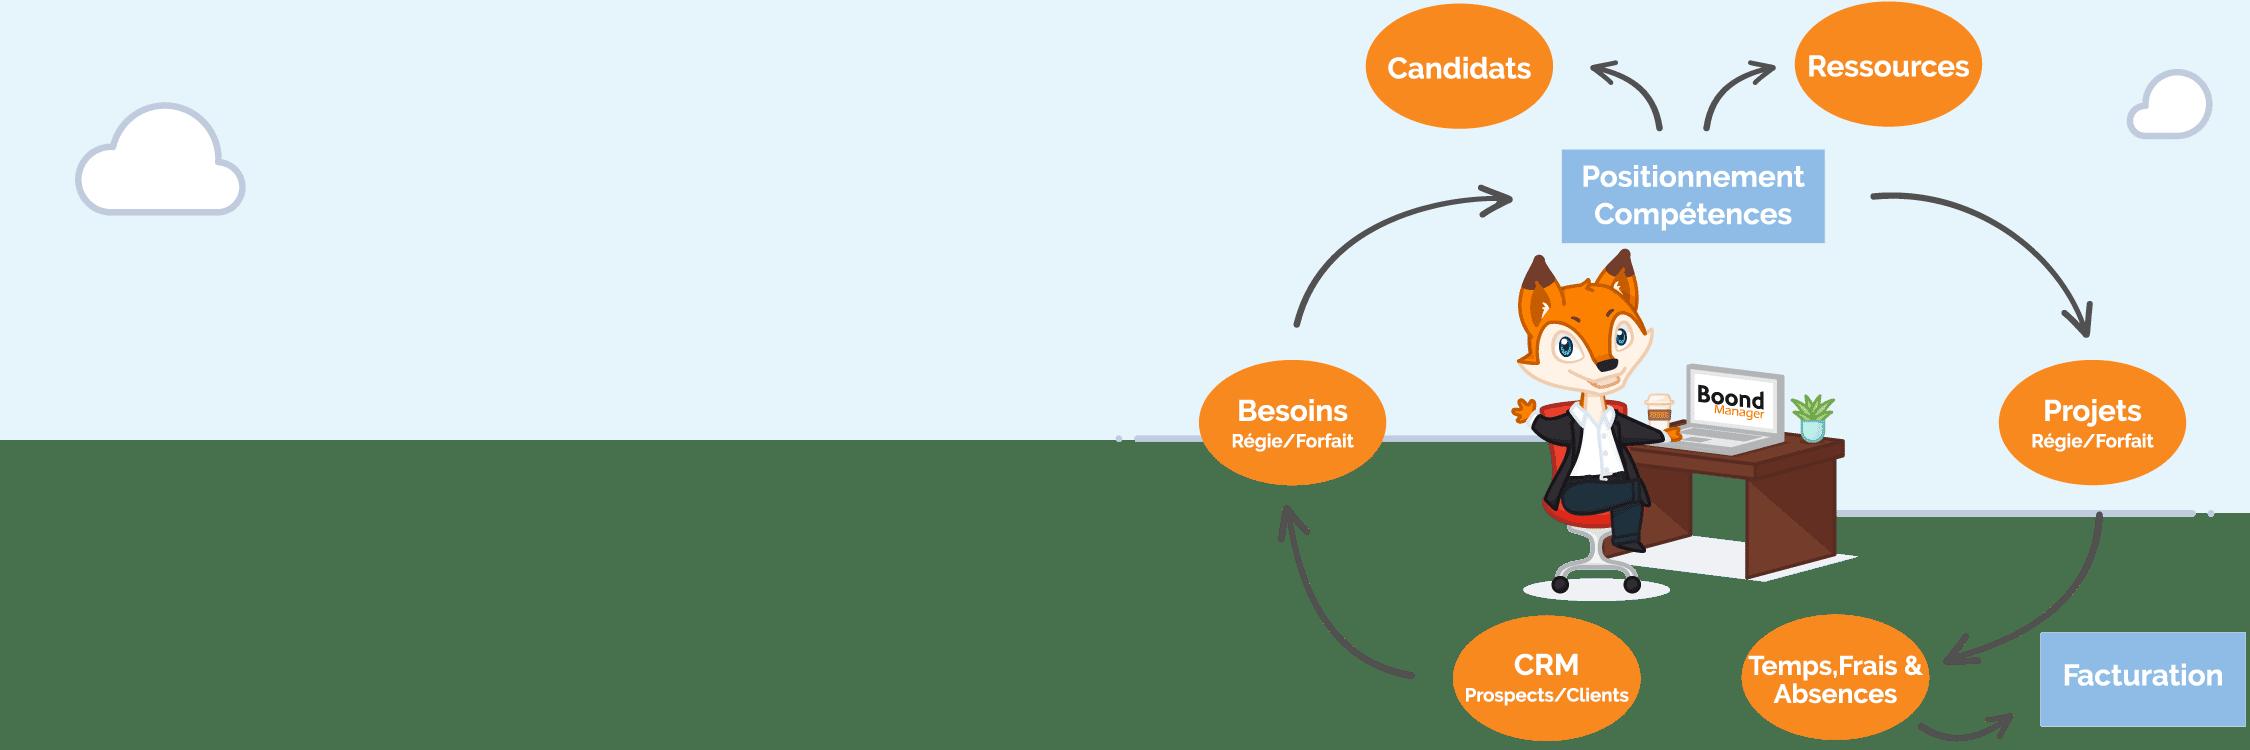 boondmanager-headers-workflow-desk-new